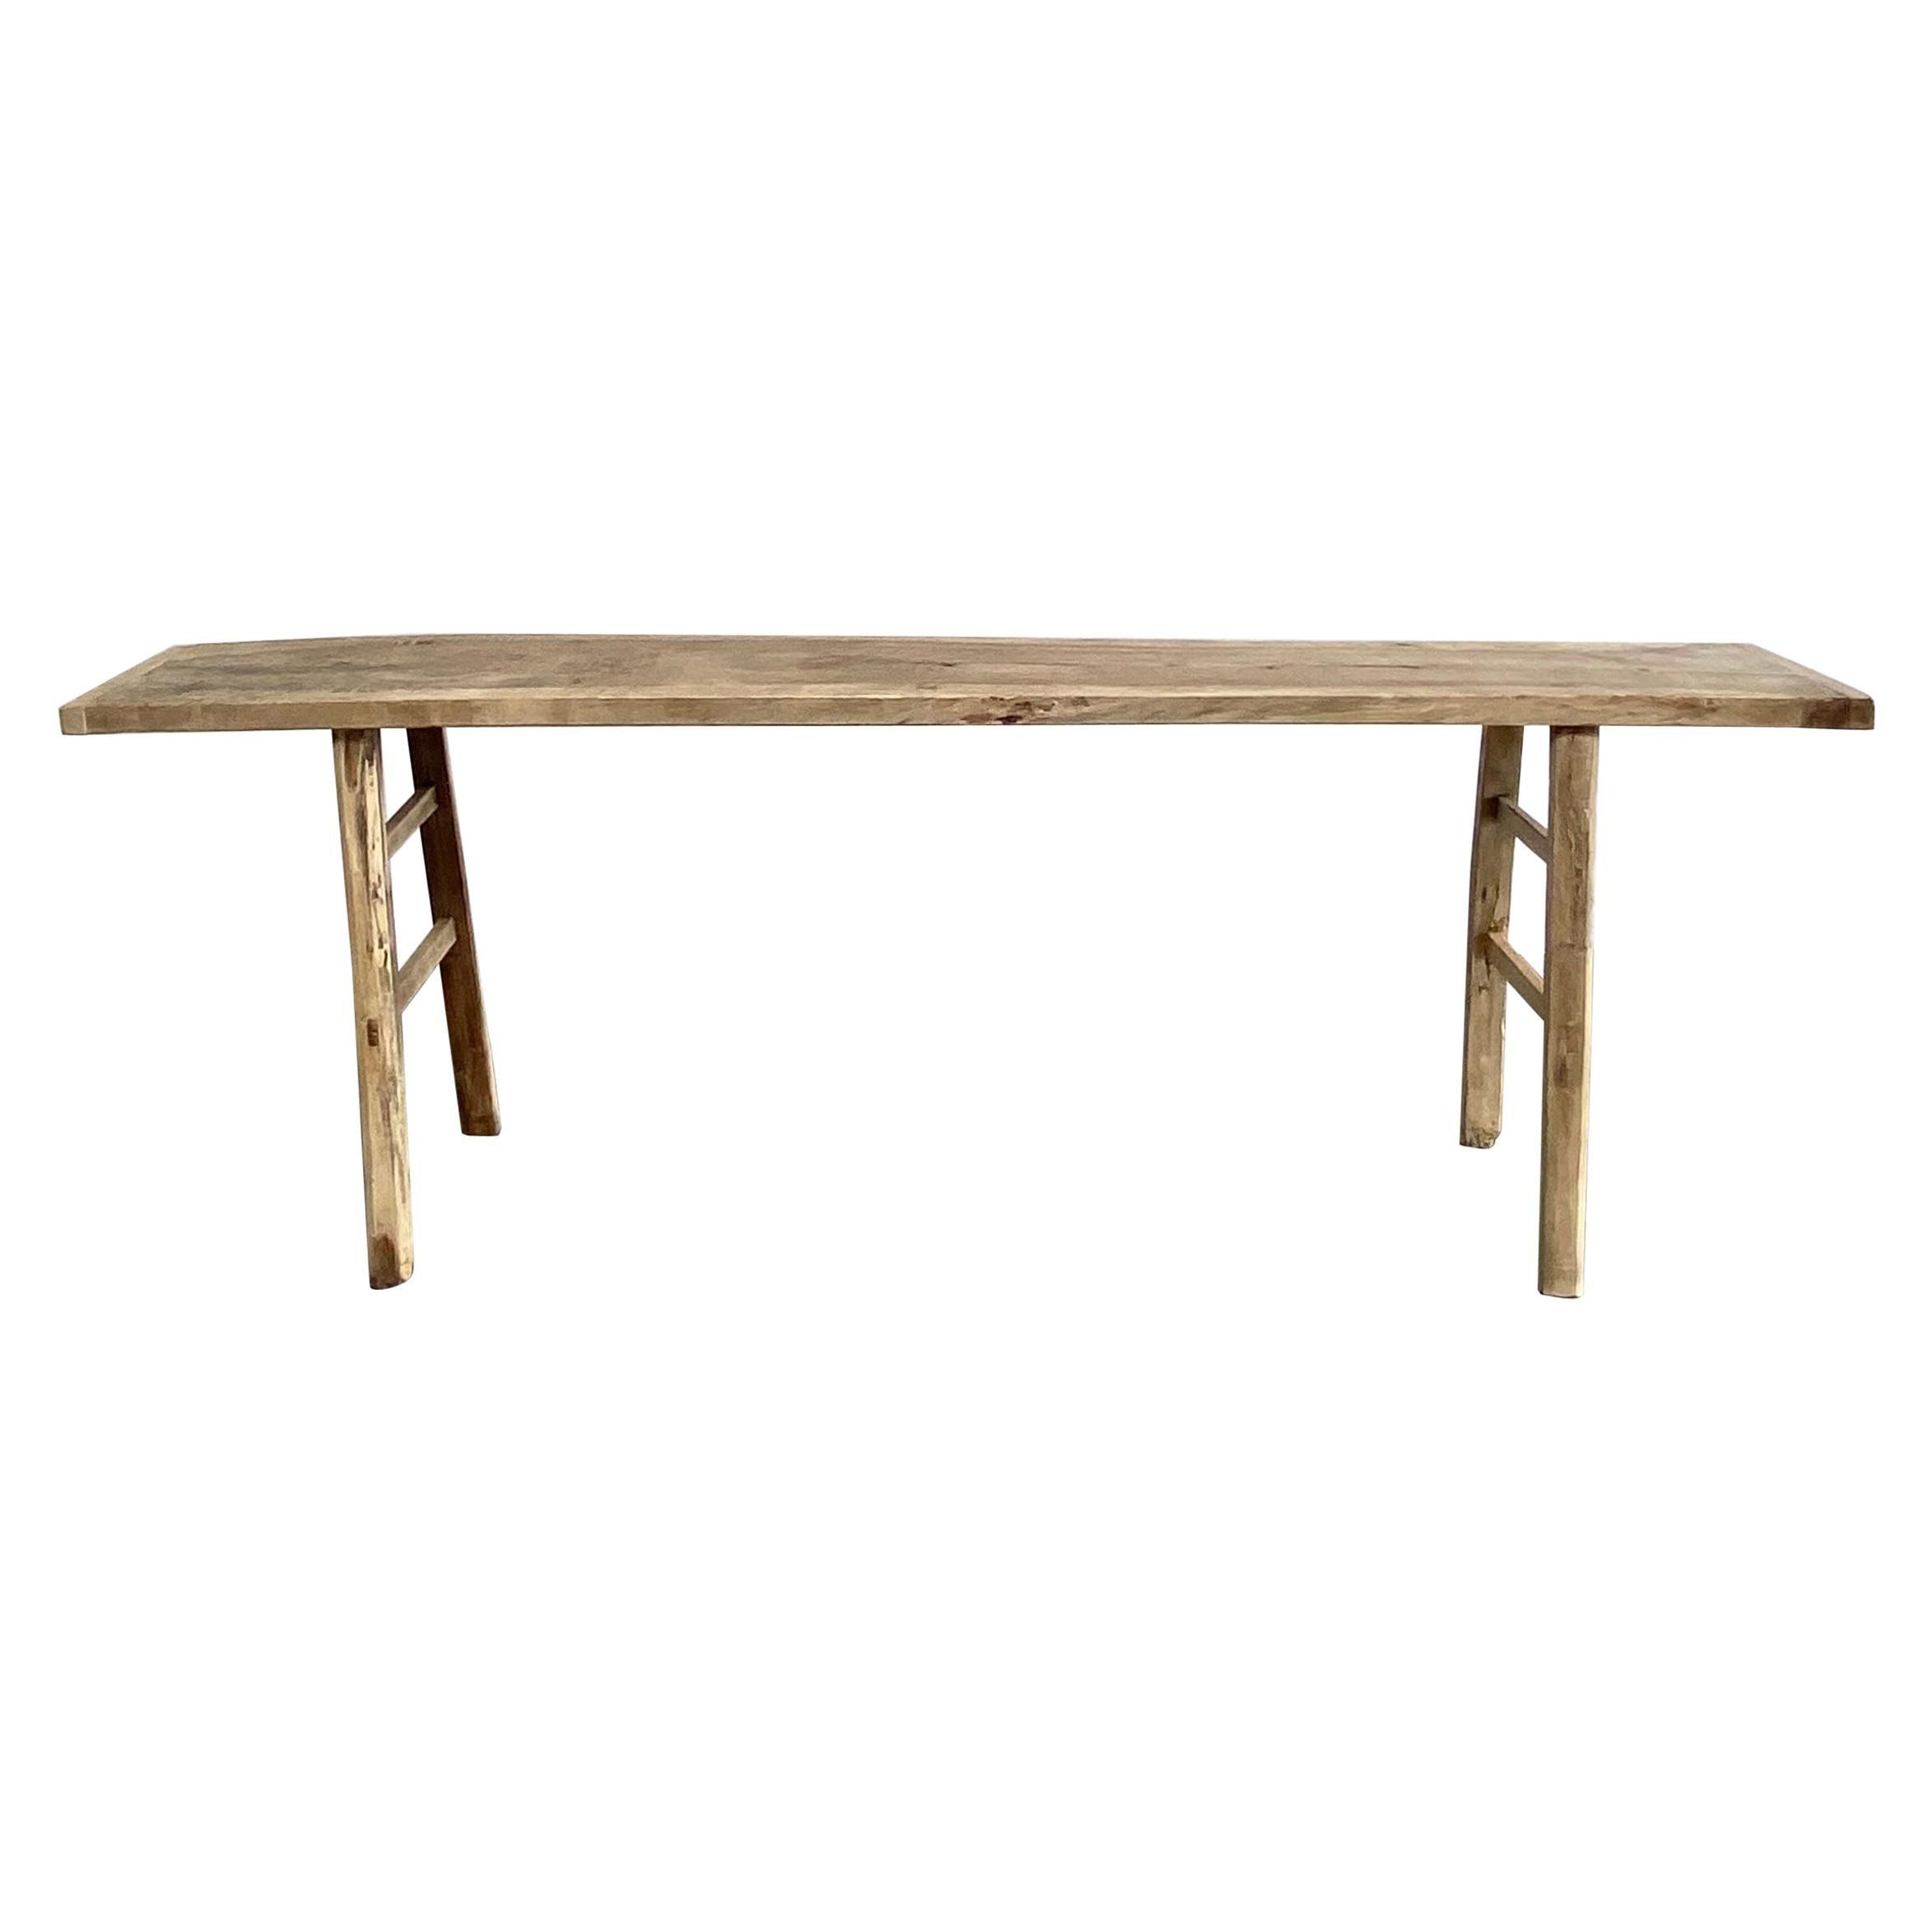 Vintage Elm Wood Rustic Console Table